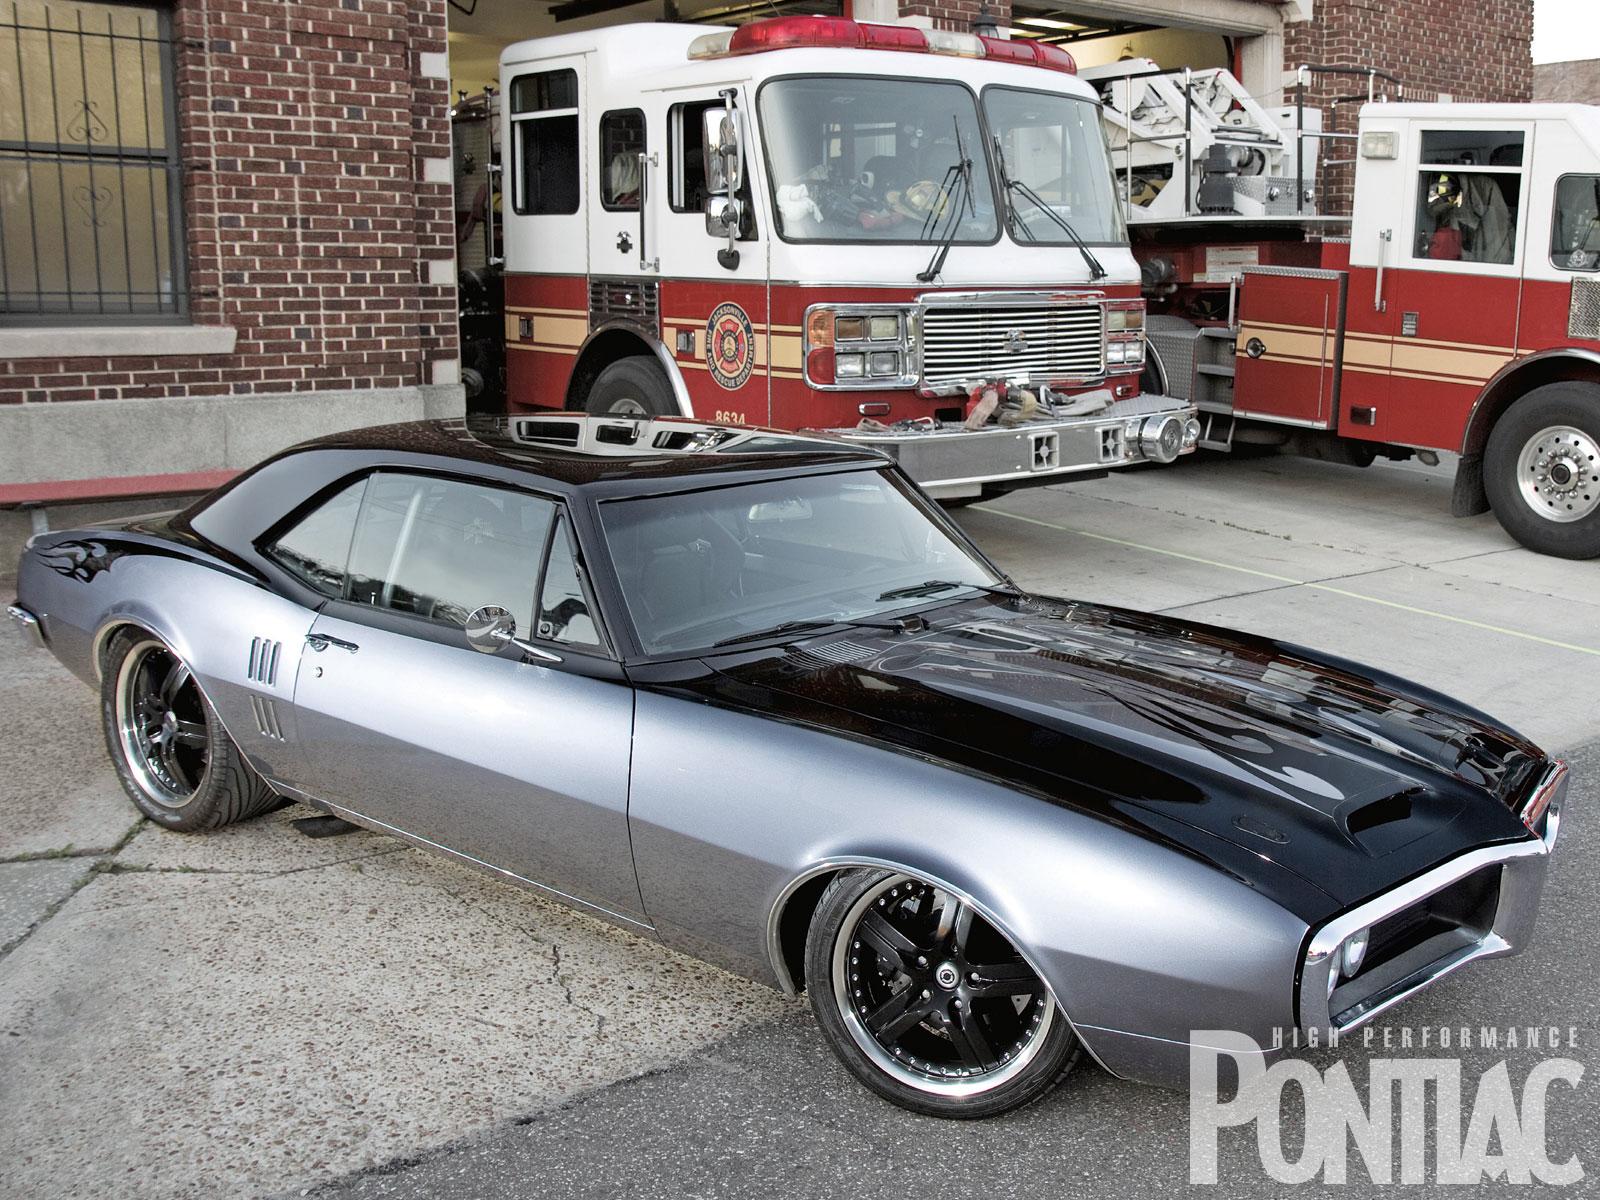 Pontiac Firebird I 1967 - 1969 Coupe-Hardtop #6